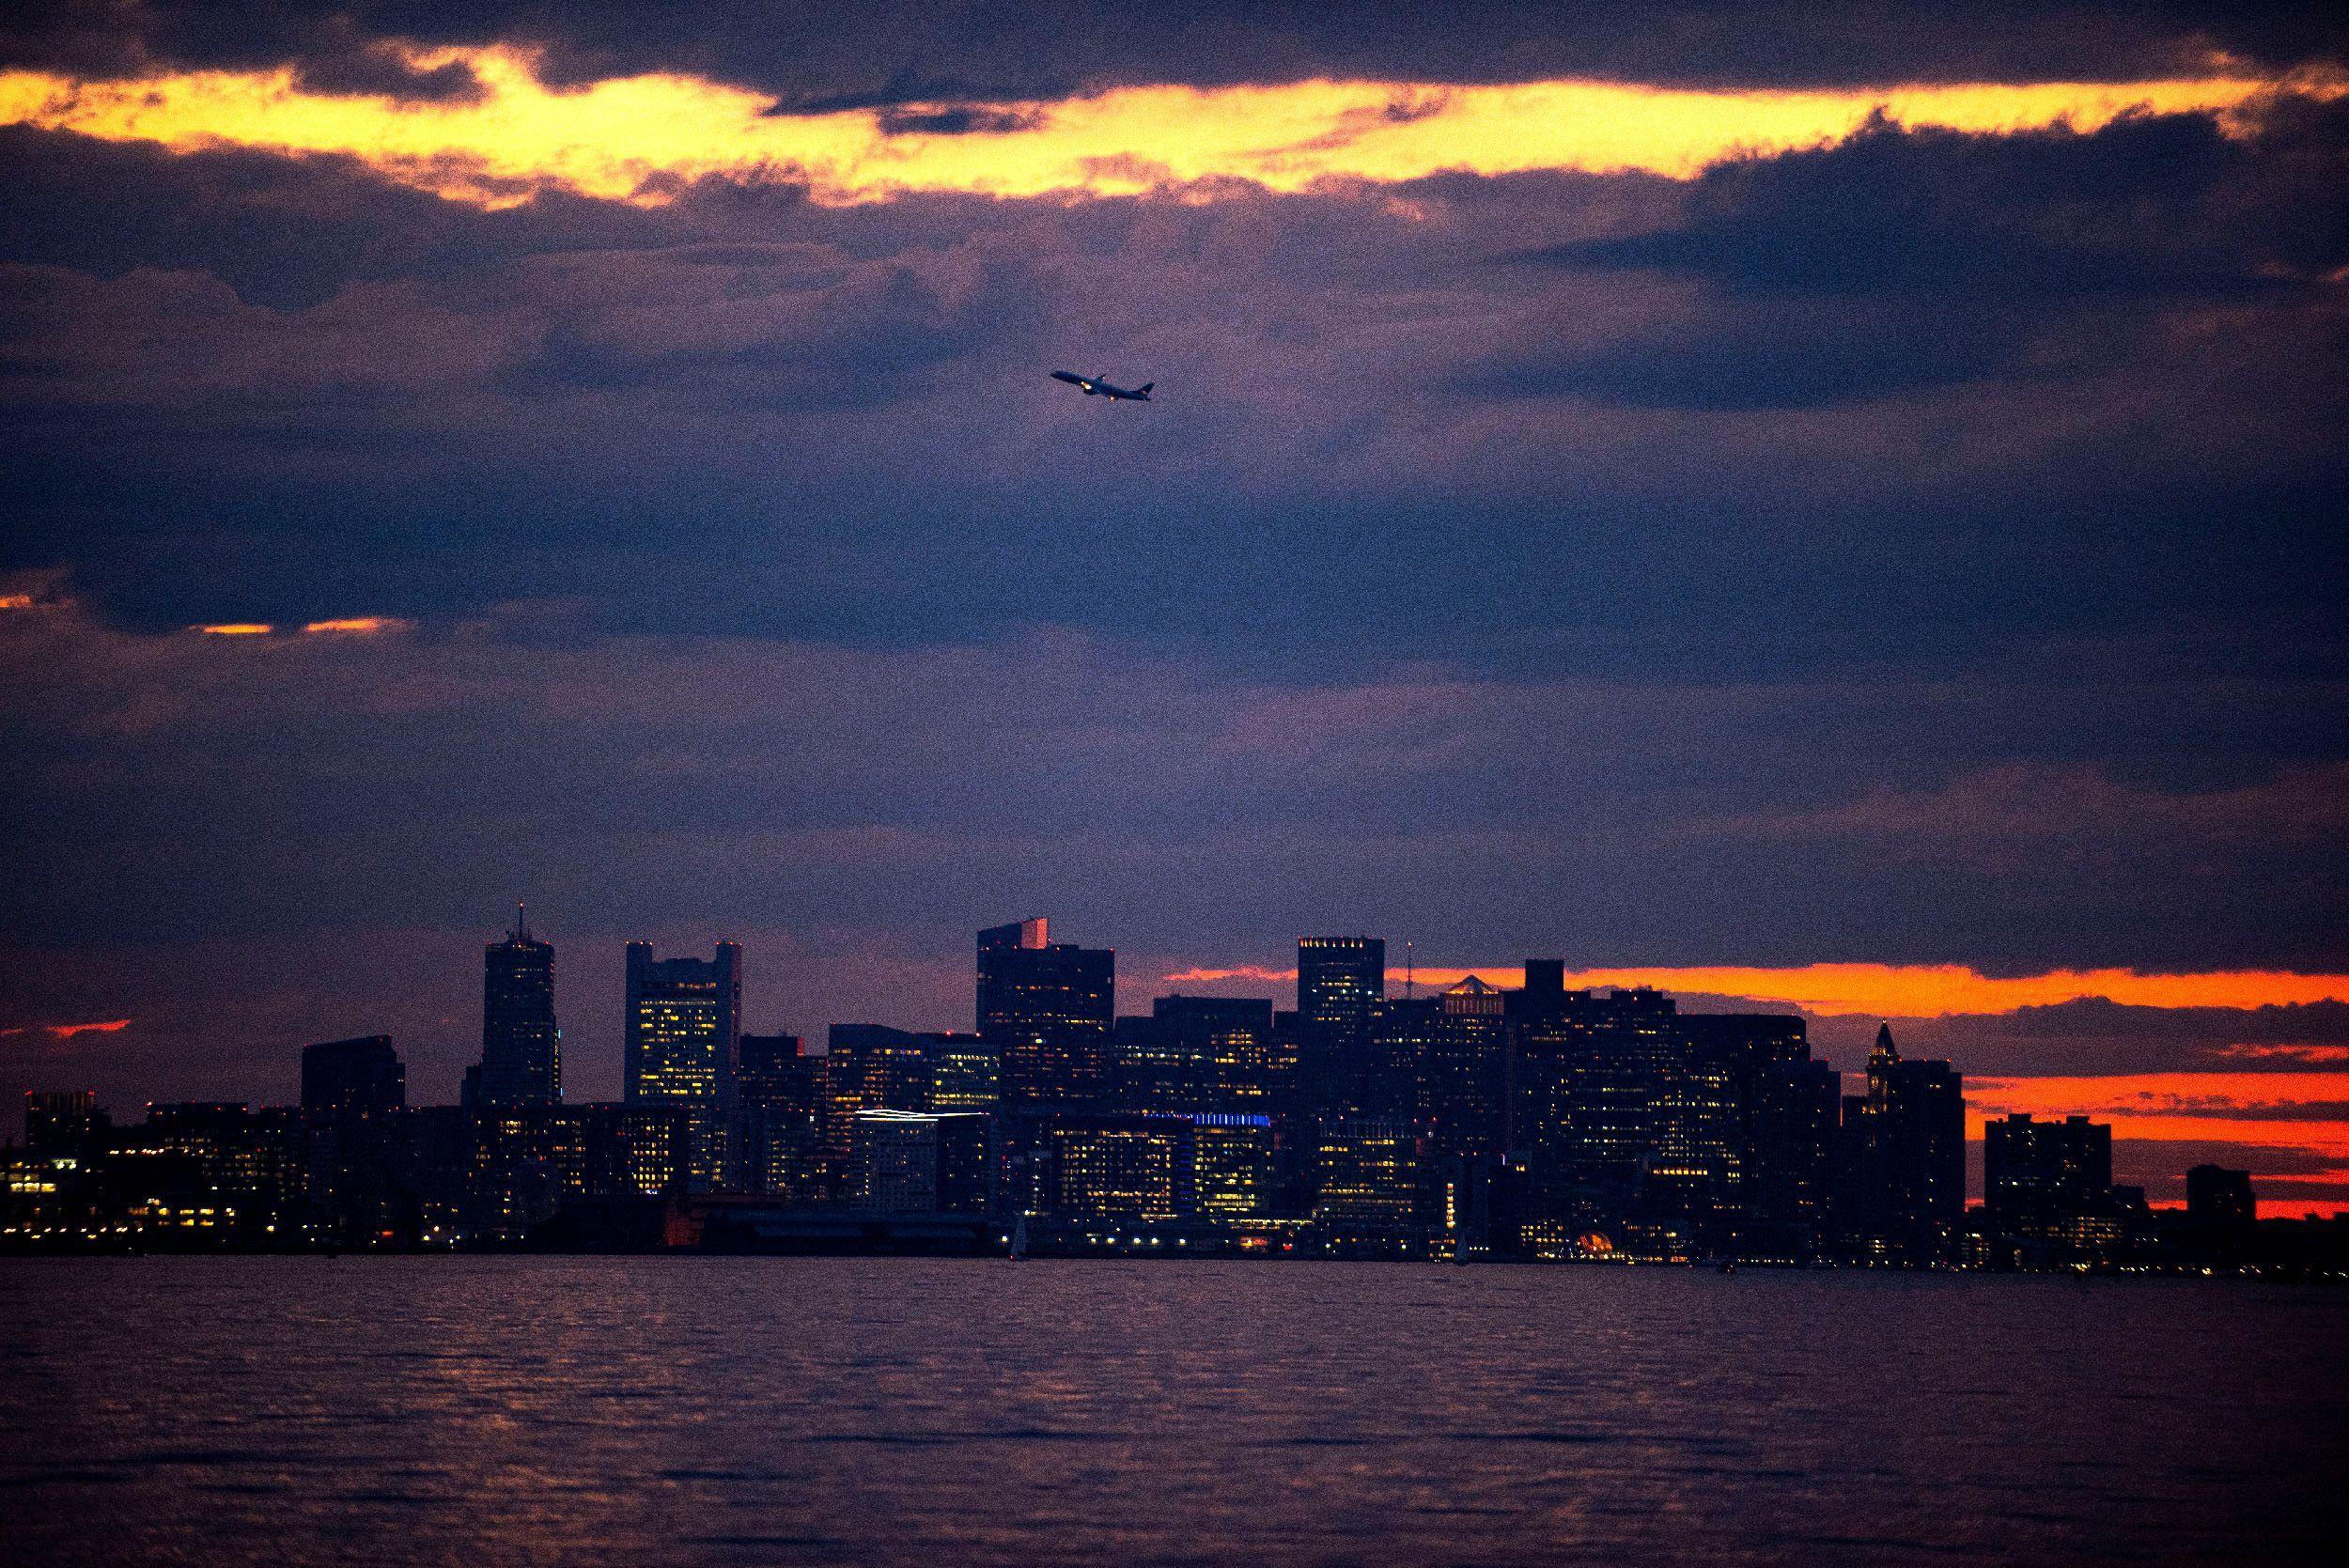 Boston Skyline from the Boston Harbor